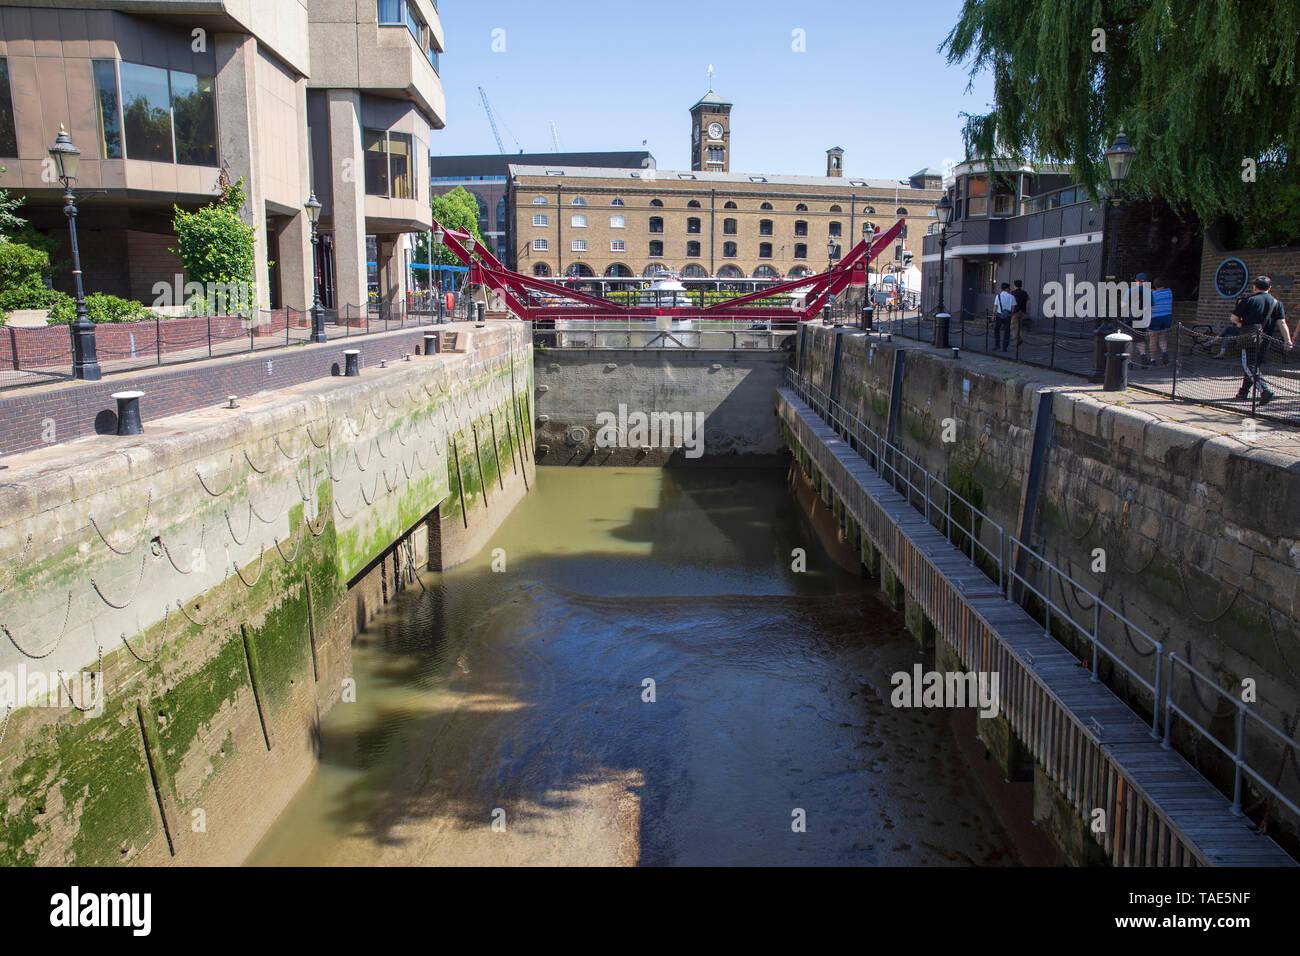 The Lock, St. Katharine's Dock, London, England. - Stock Image